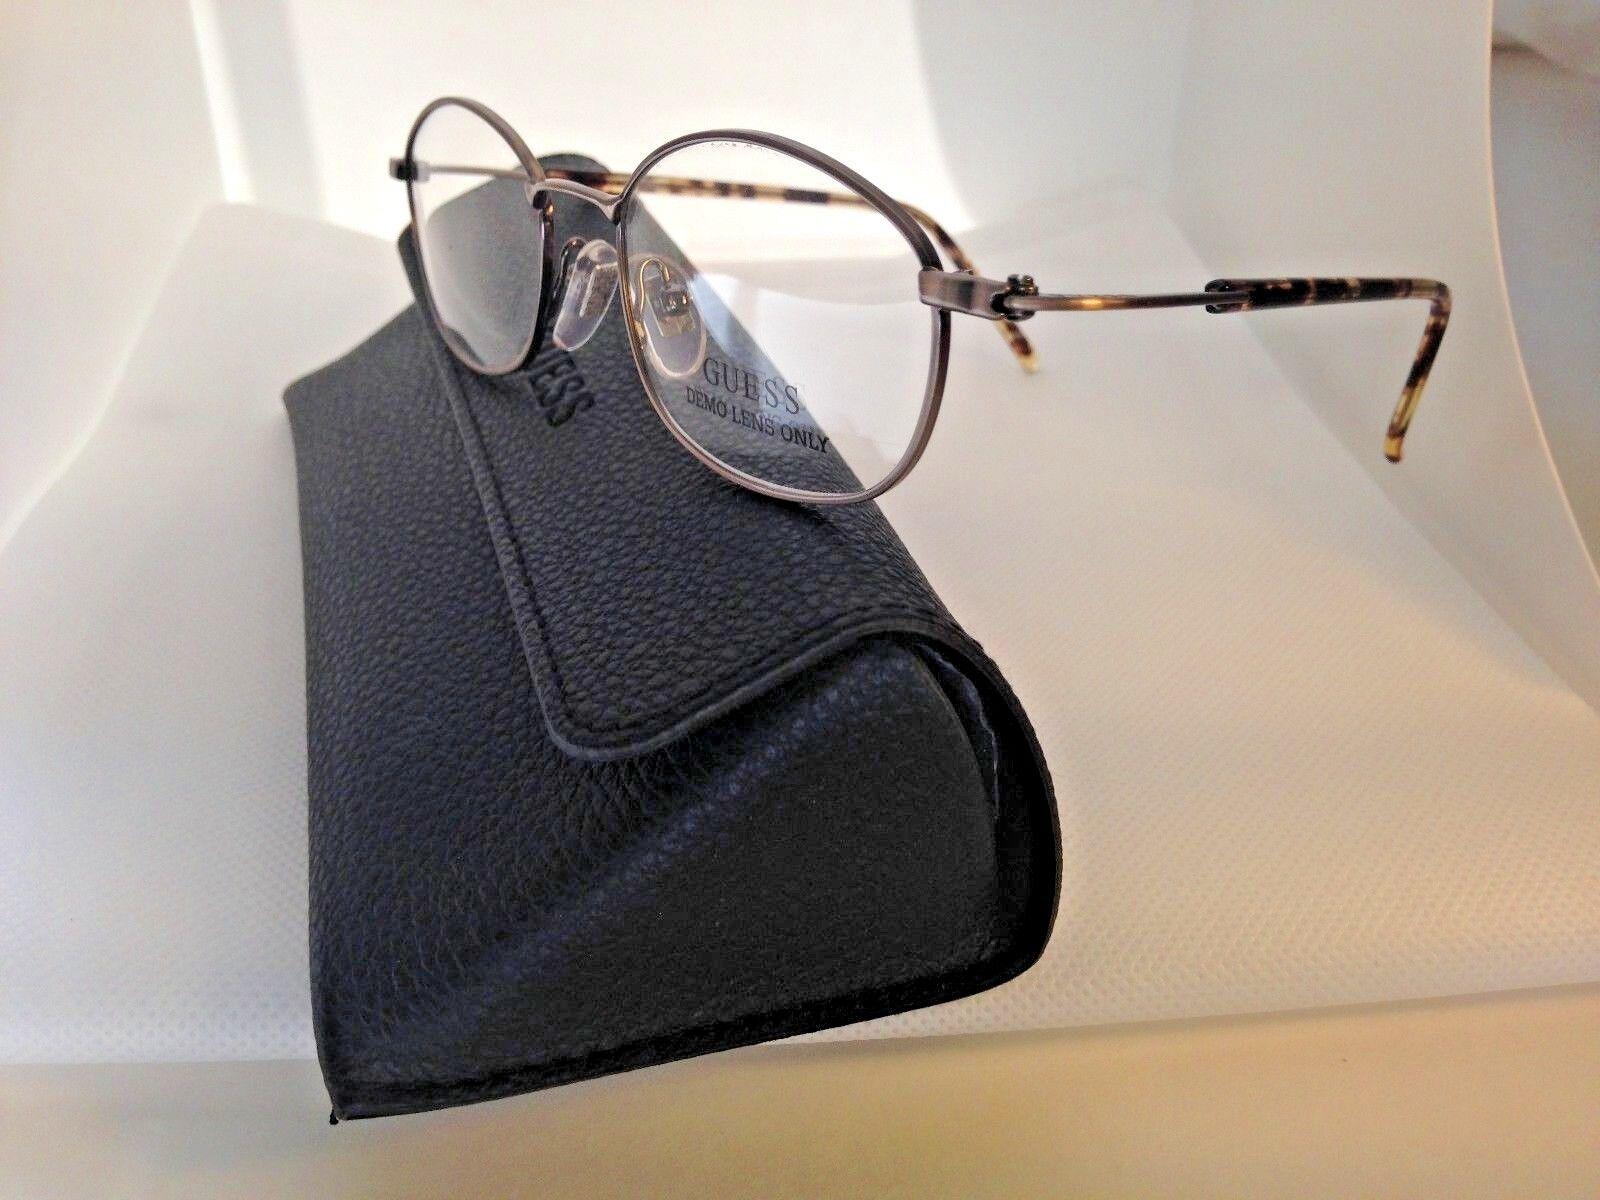 Guess Eyeglass Frames GU596 ABR 48-20-140MM Brown/Tortoise Store Model & Case